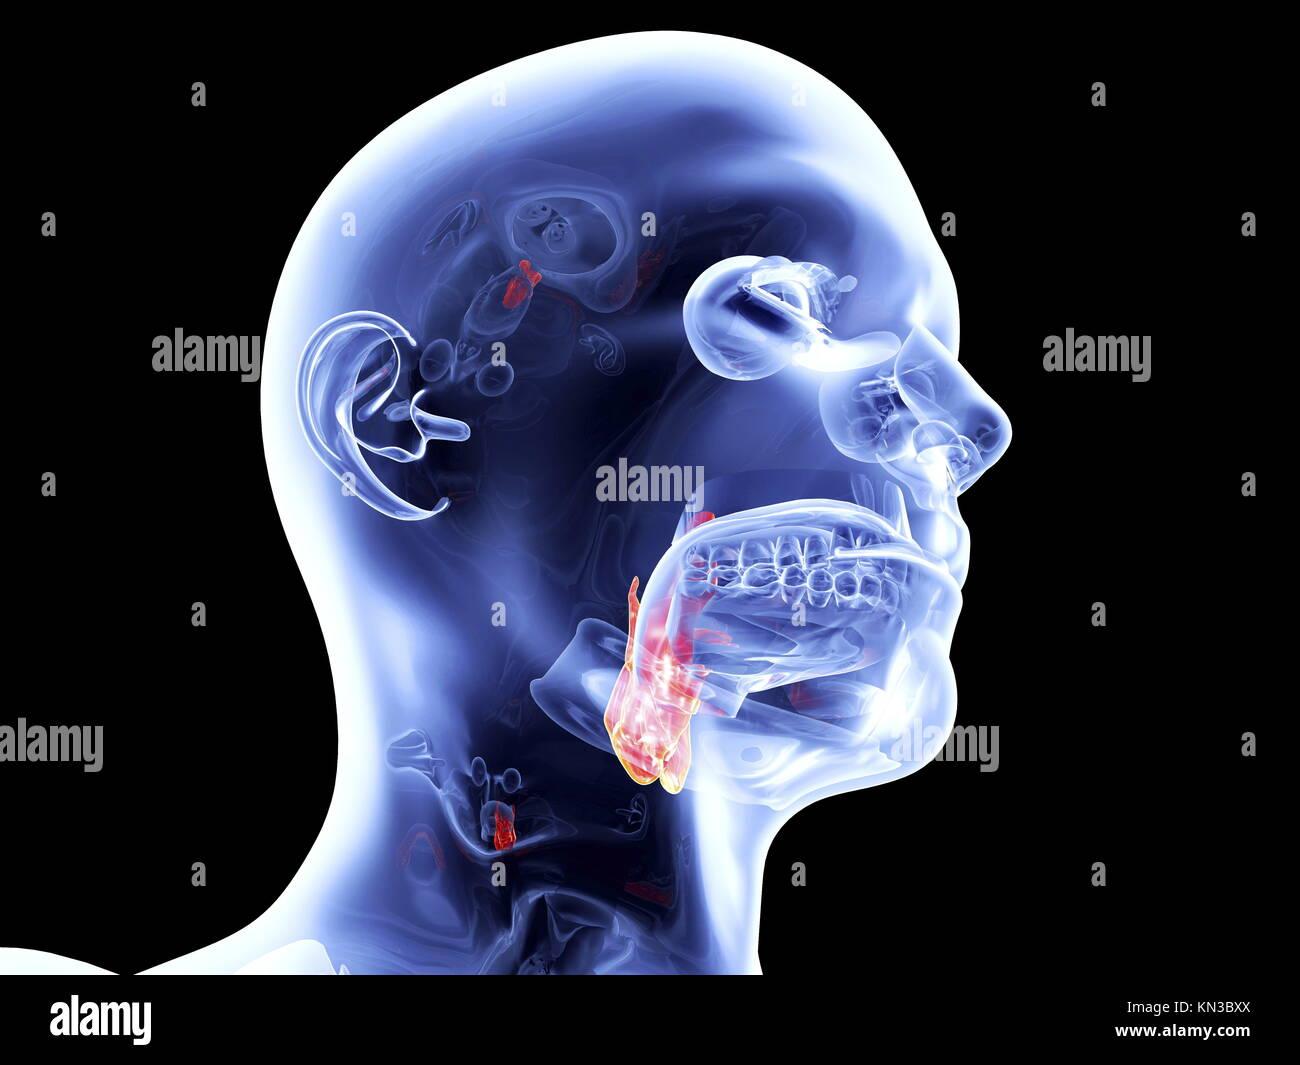 Larynx Imágenes De Stock & Larynx Fotos De Stock - Alamy